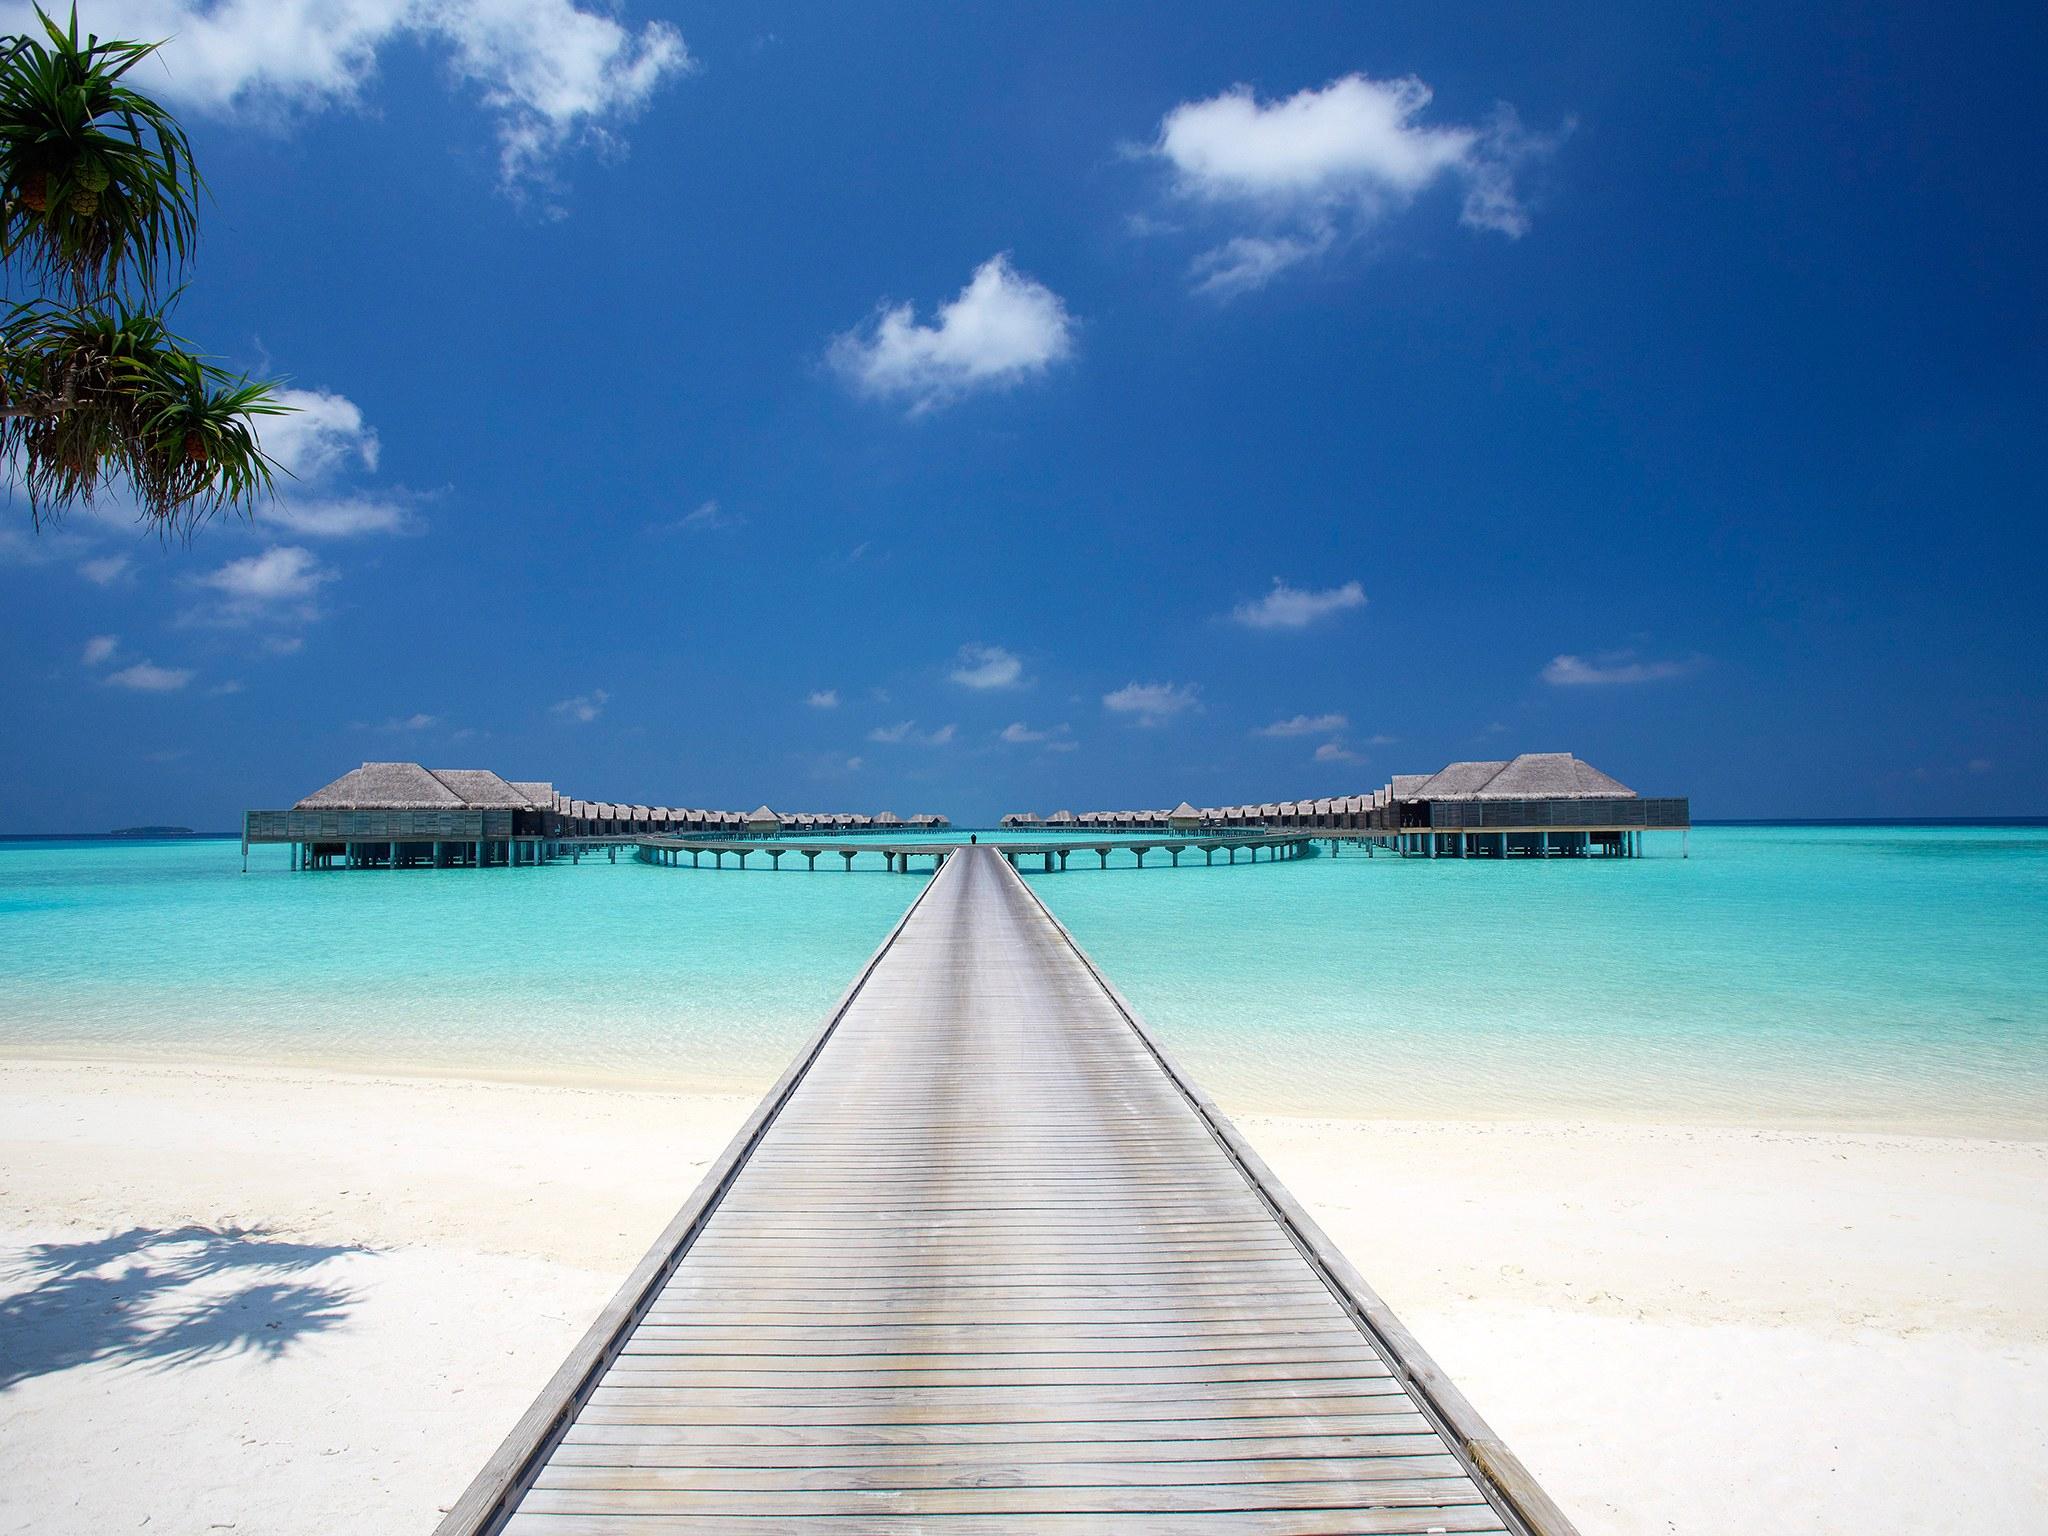 Maldives island holiday